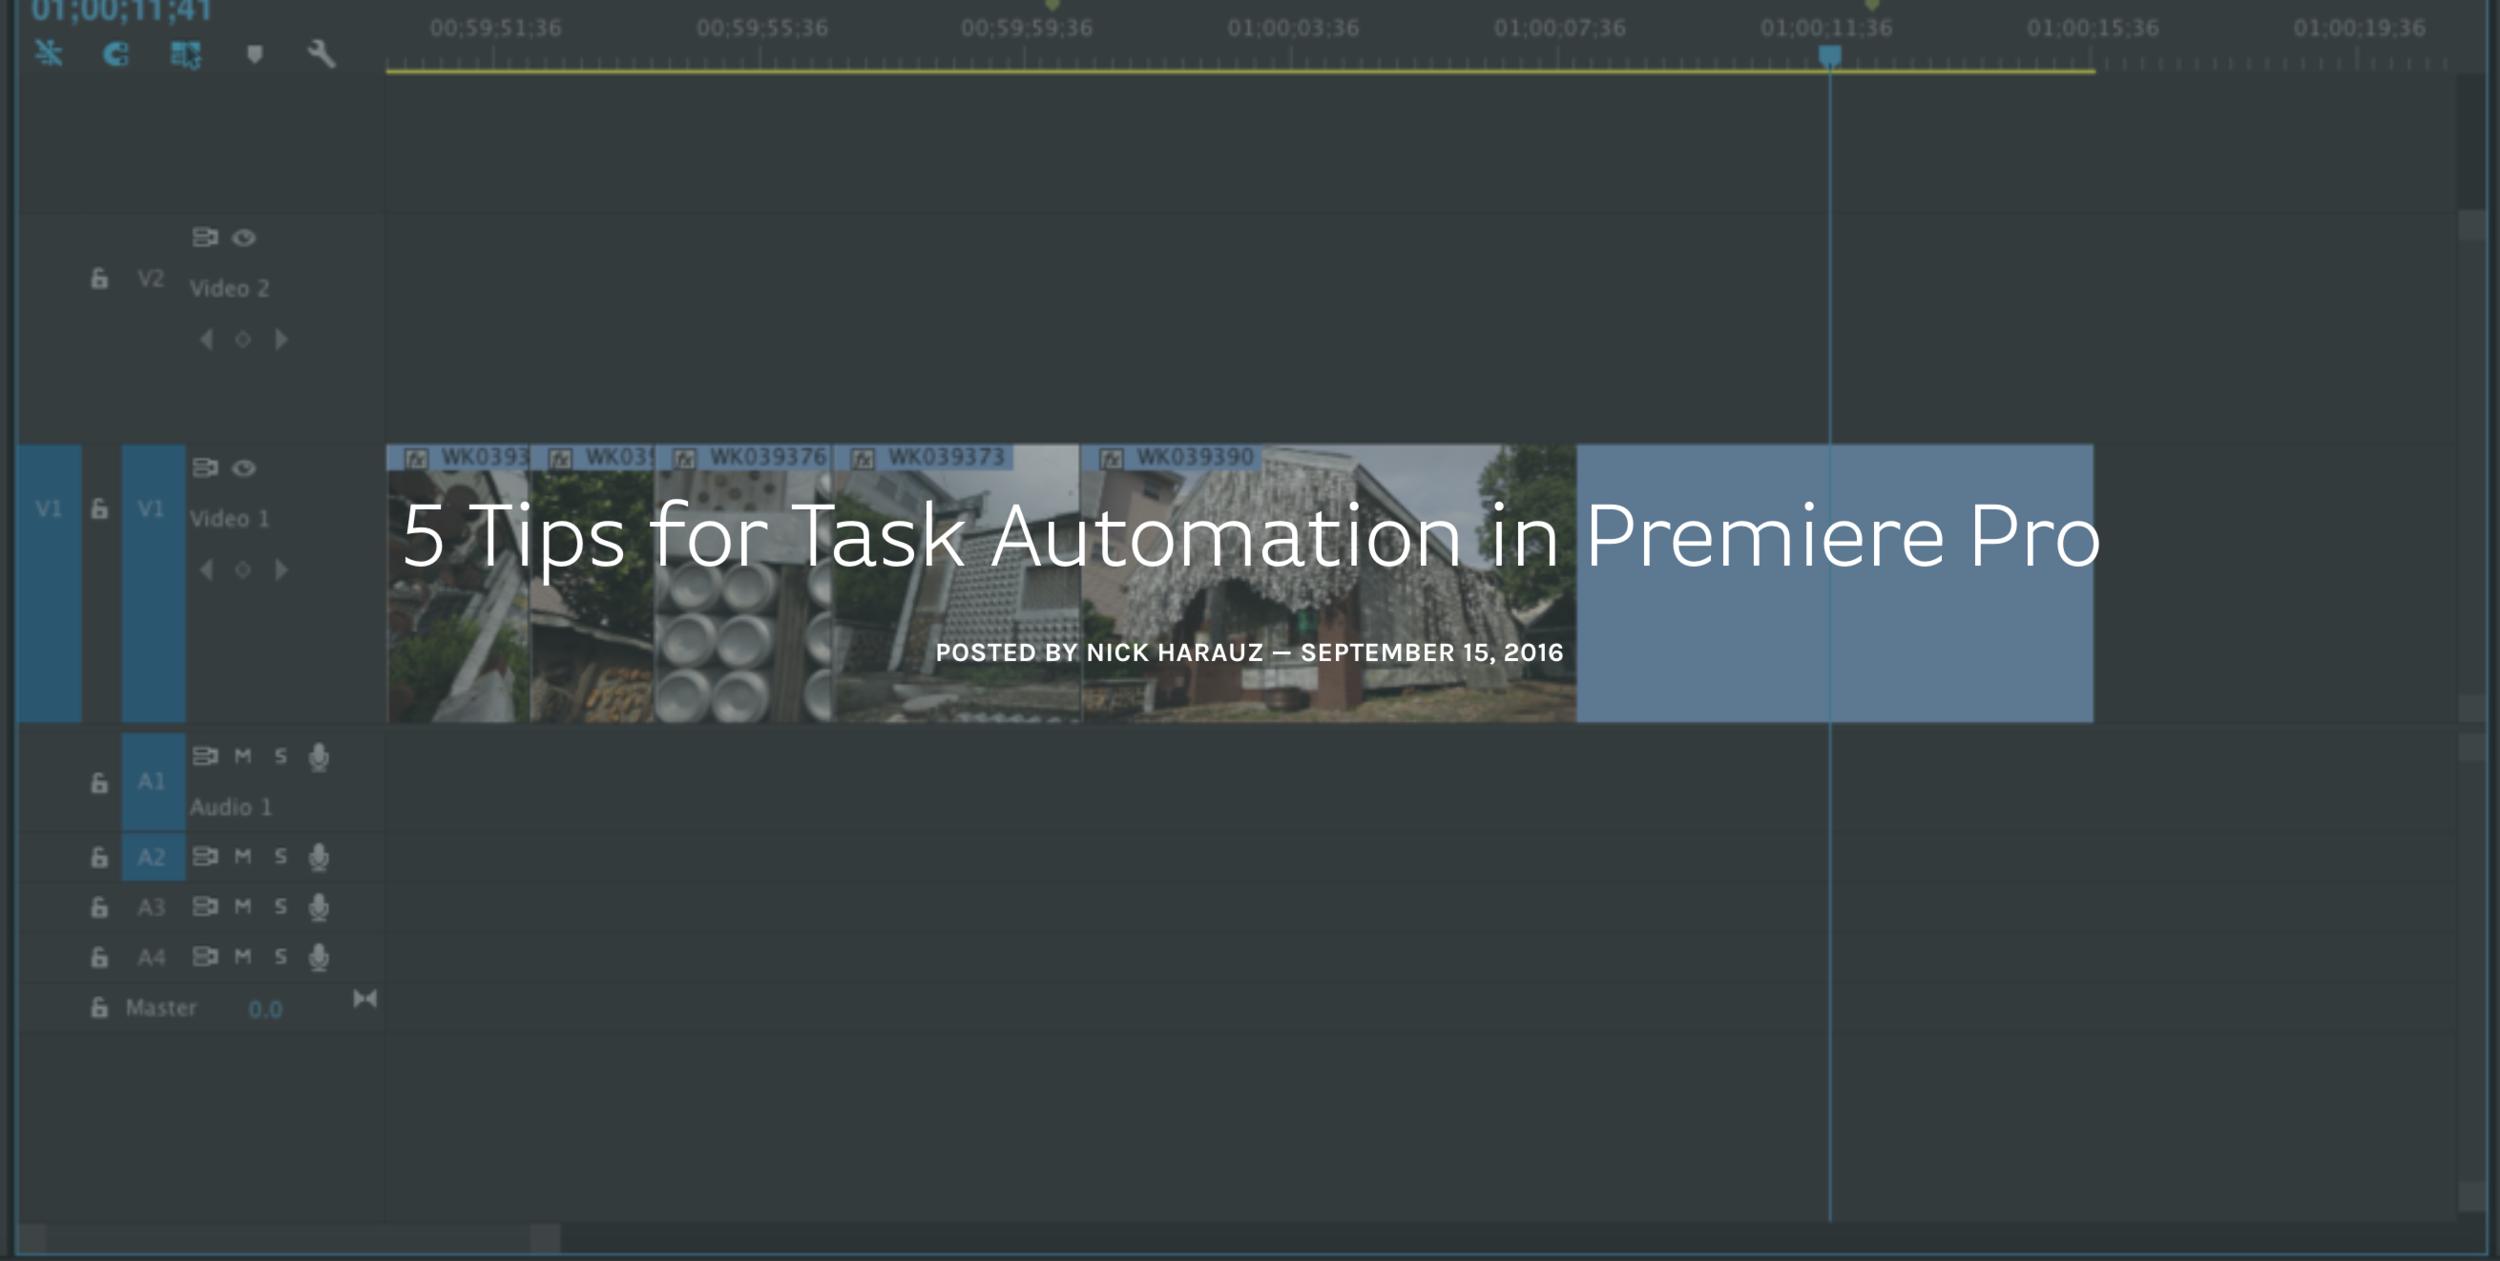 task-automation-premiere-pro-screenlight-nick-harauz